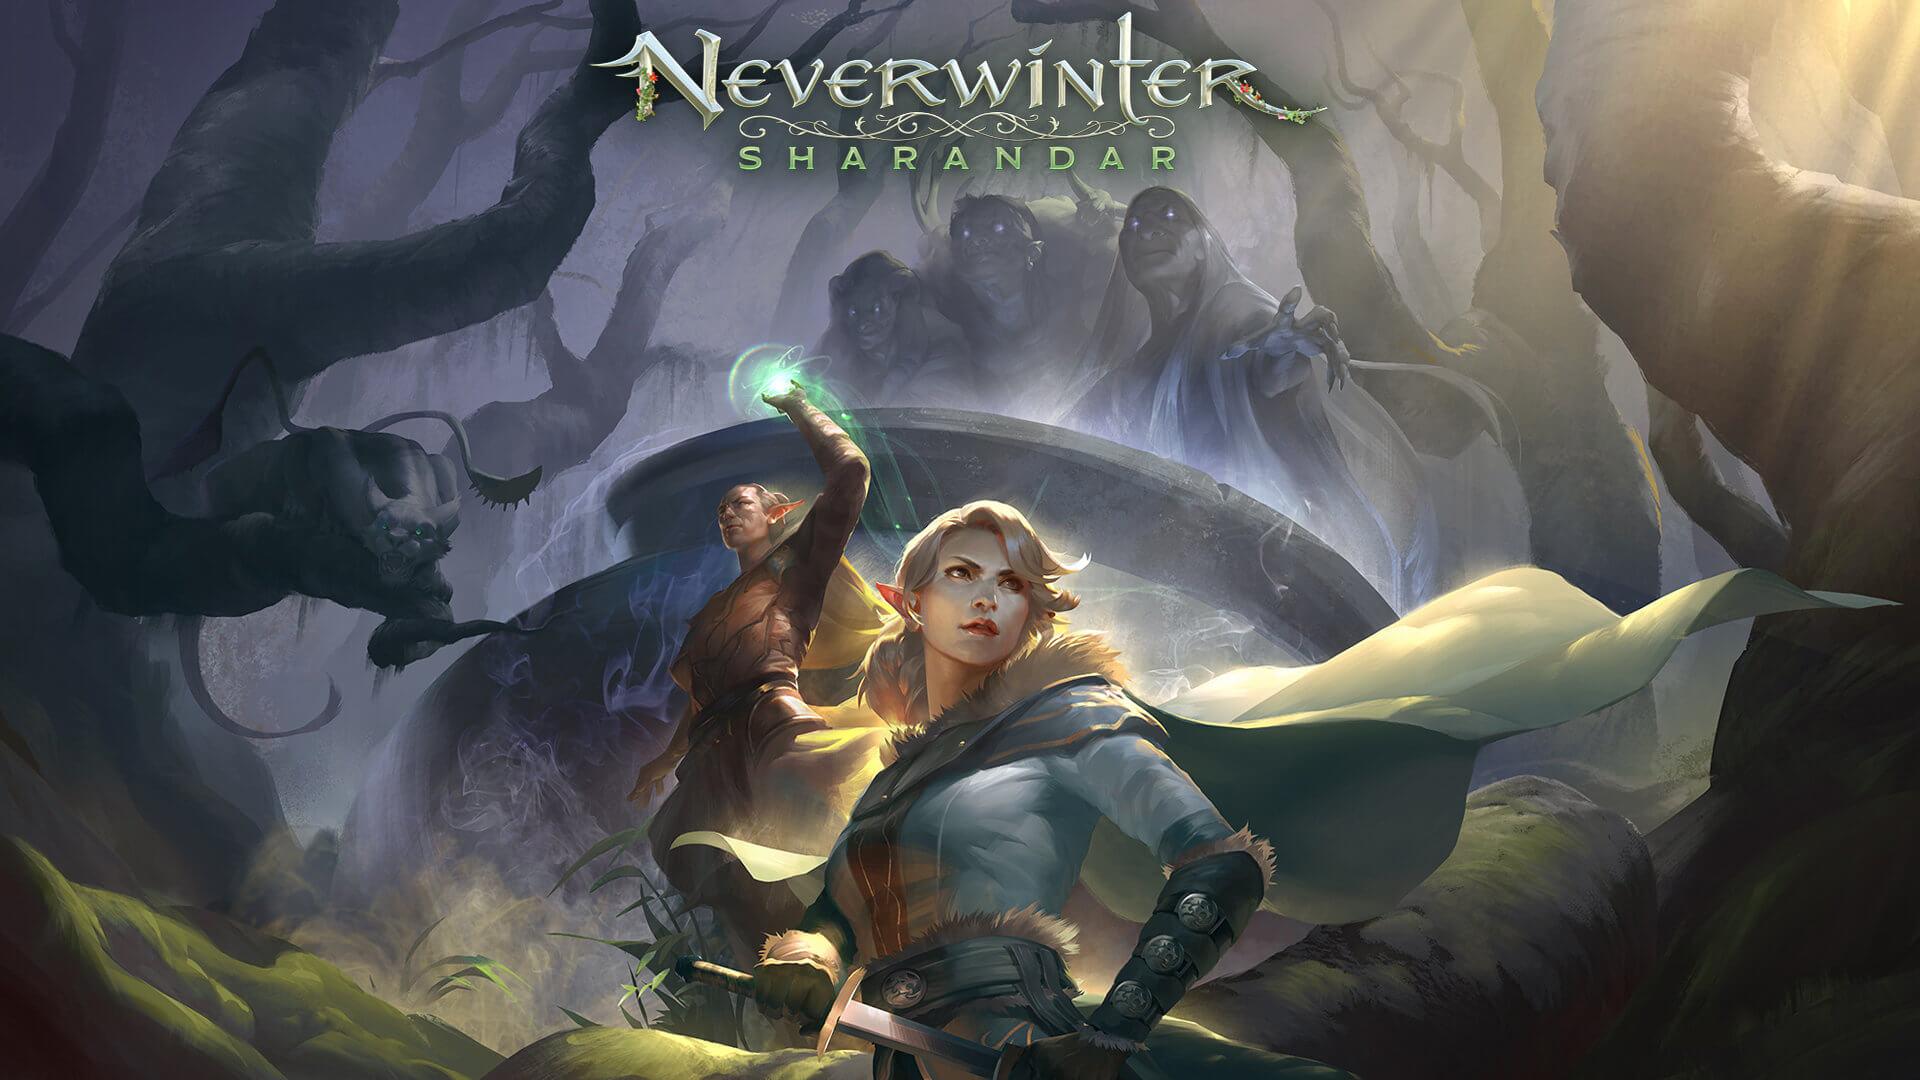 Neverwinter-Sharandar-Artwork-001